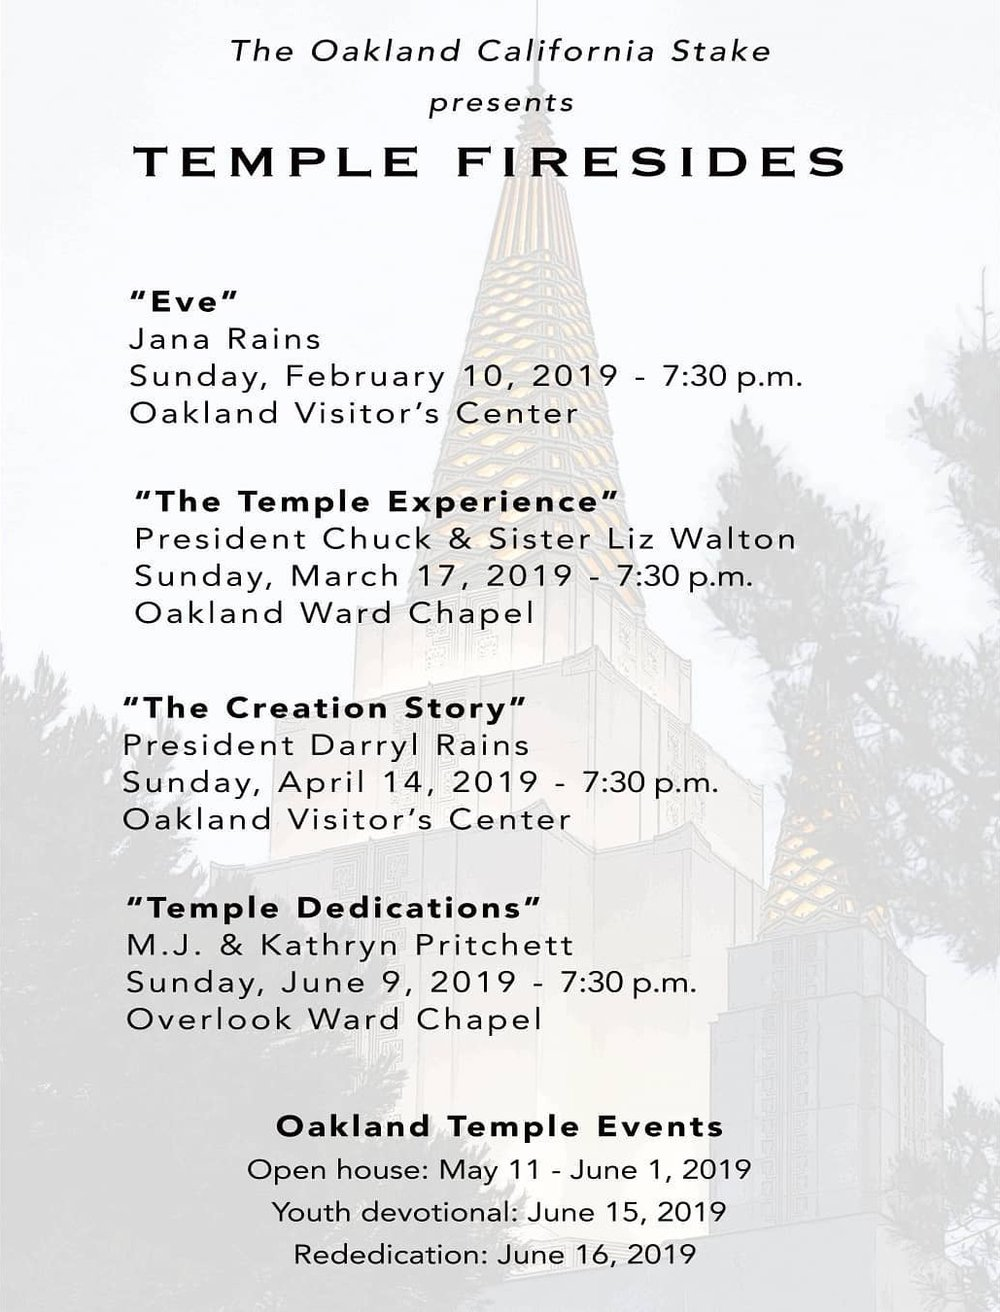 Oakland Stake Firesides